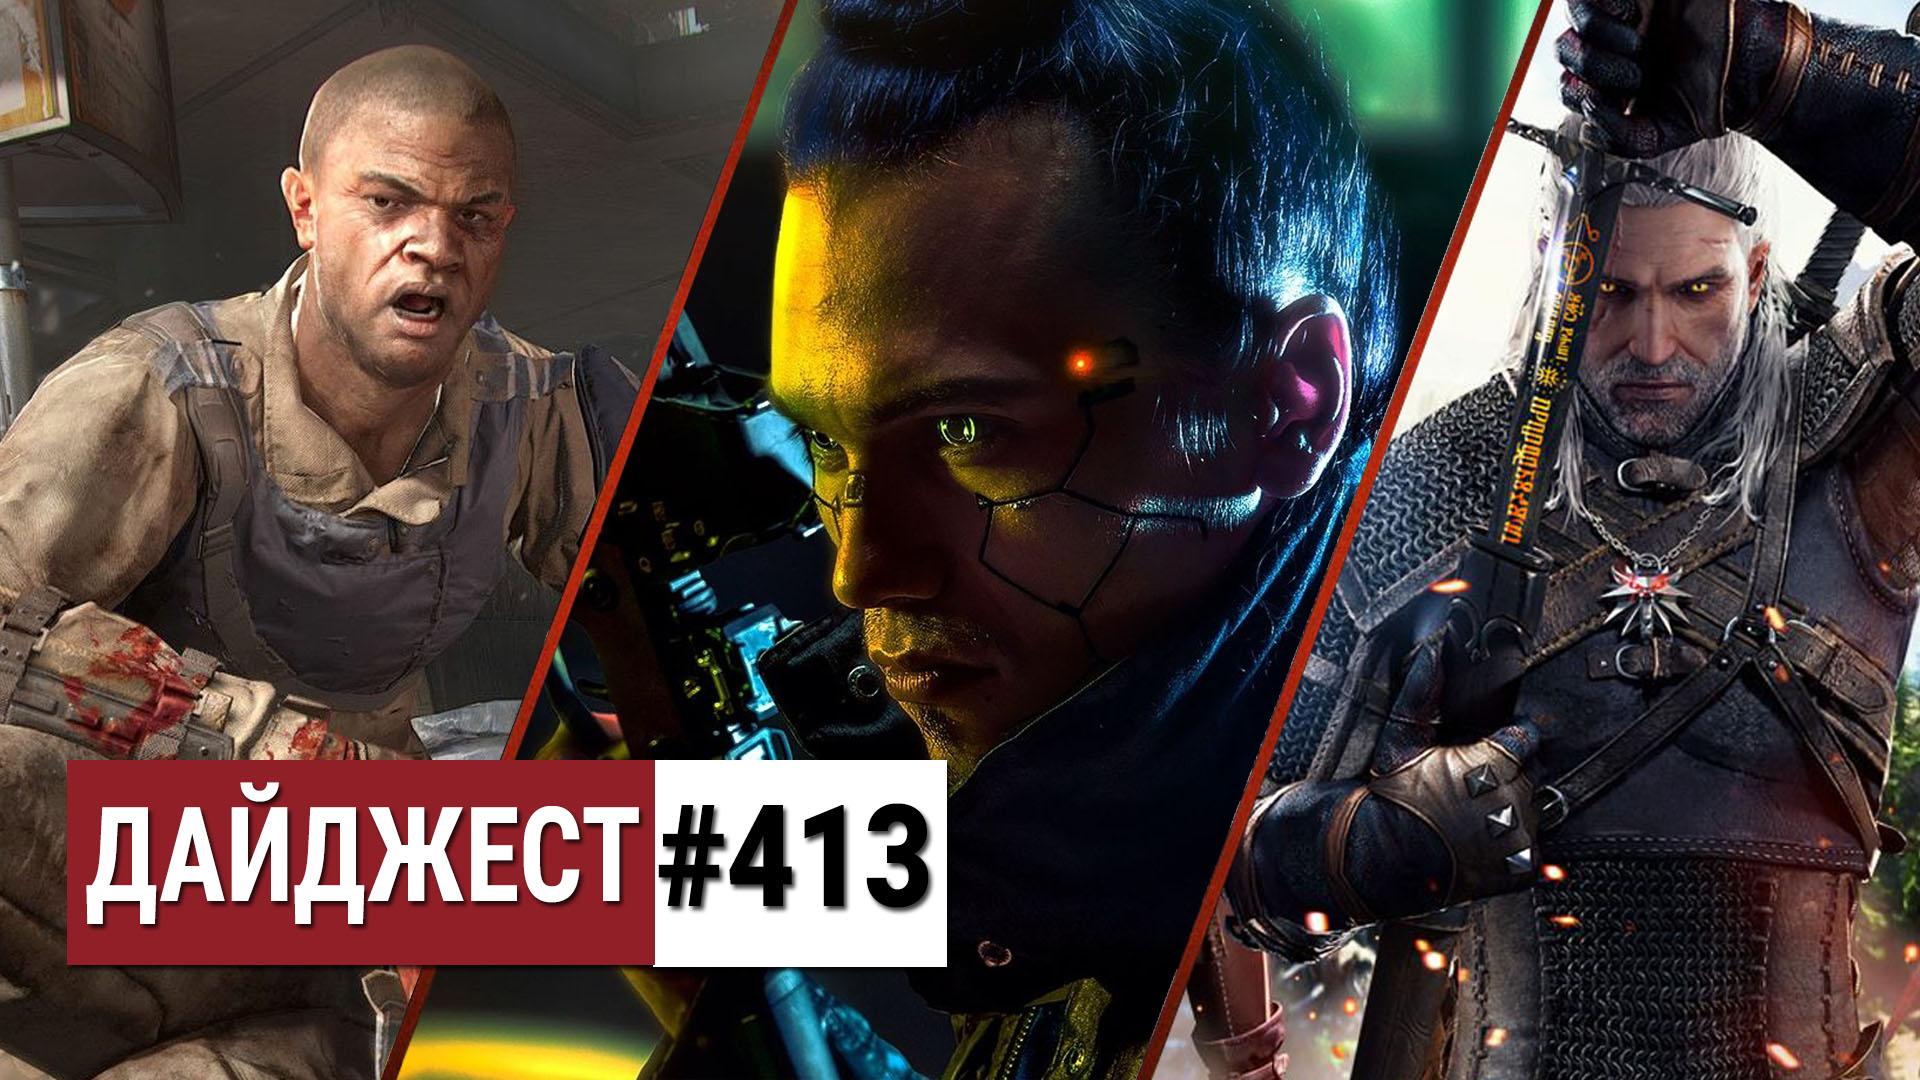 Геймплей Cyberpunk 2077 и Dying Light 2 и новая The Witcher: дайджест #413